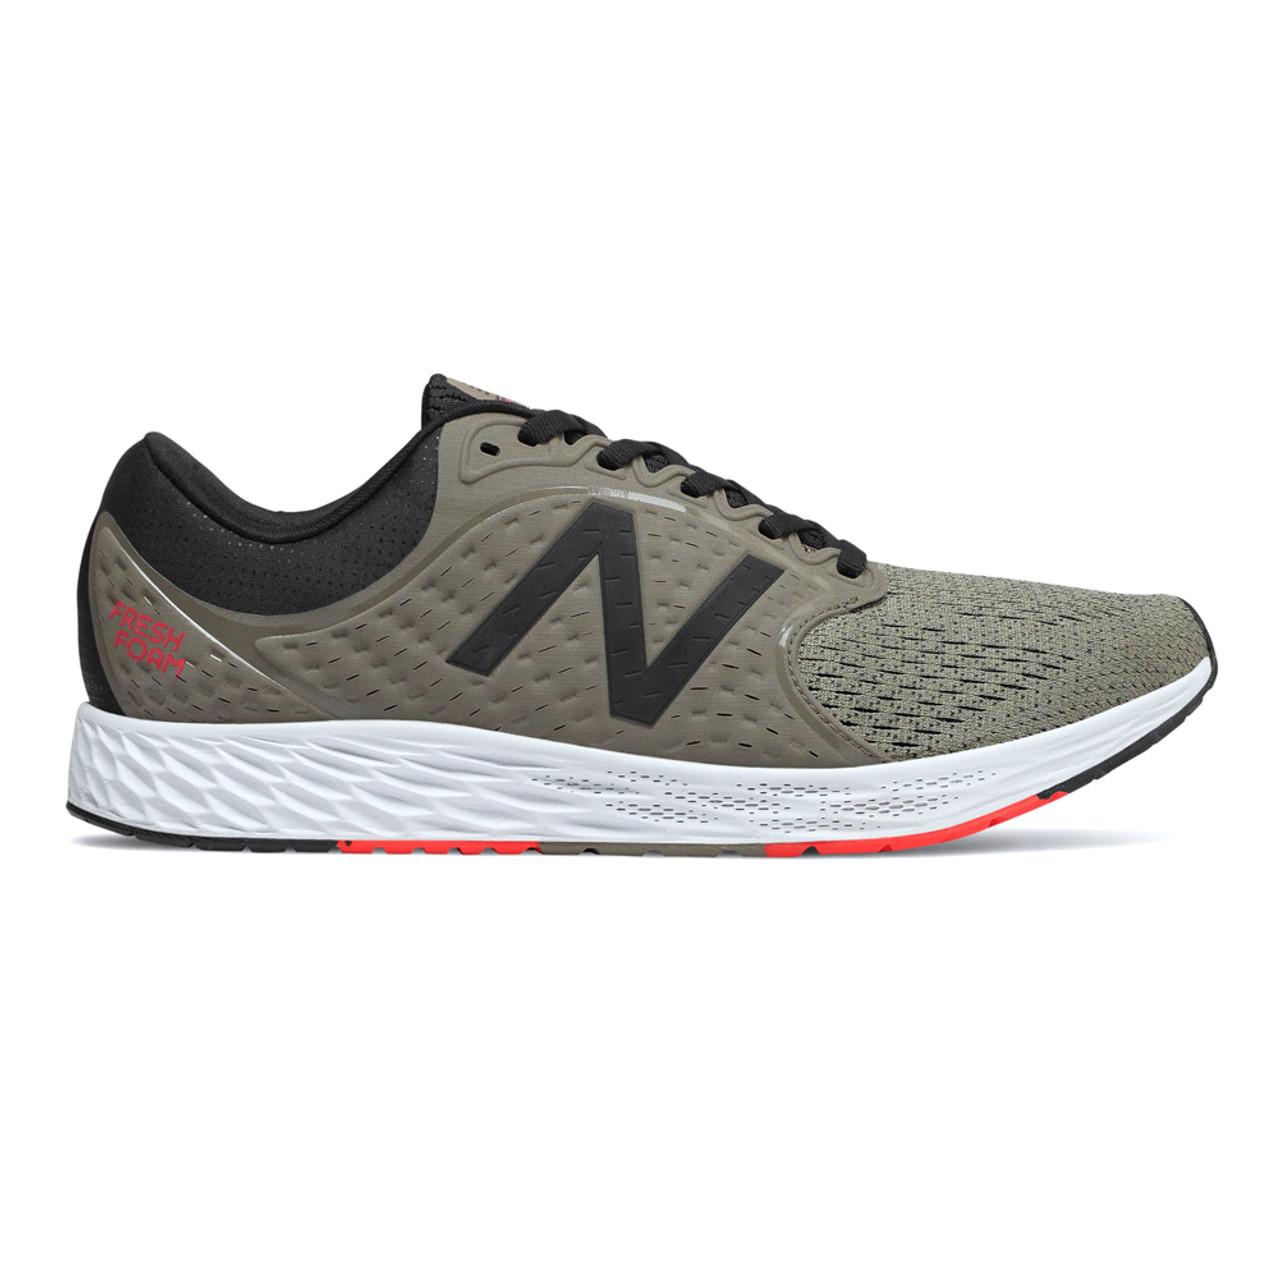 53189ac013af0 New Balance Men's MZANTMF4 Running Shoe Urban Grey/Black - Shop now @  Shoolu.